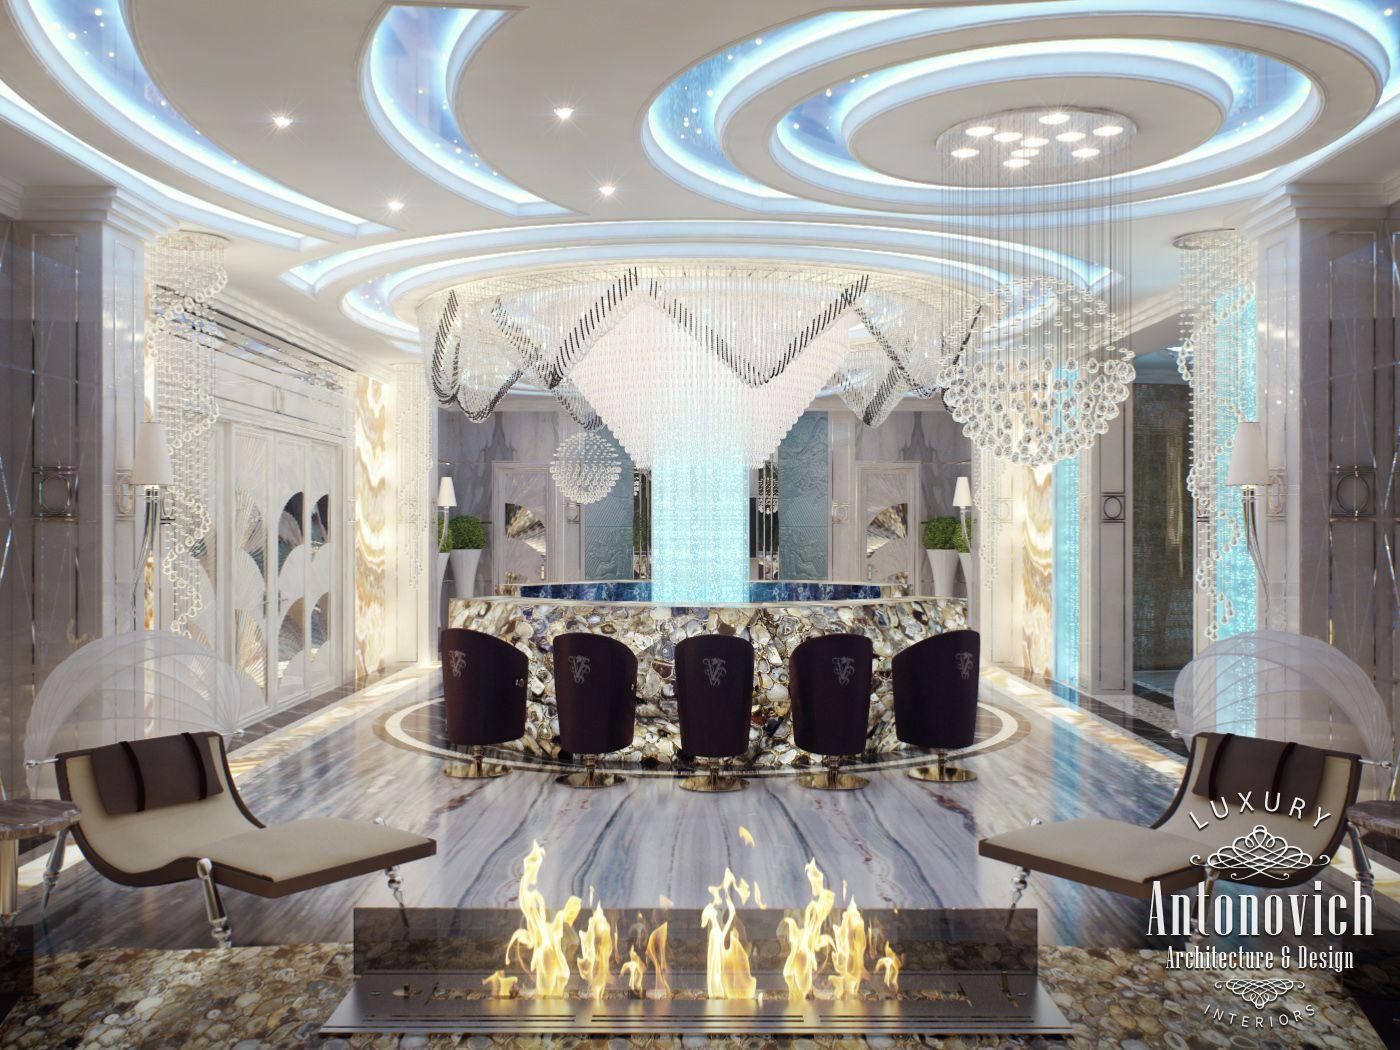 Luxury Antonovich Design Uae сентября 2015